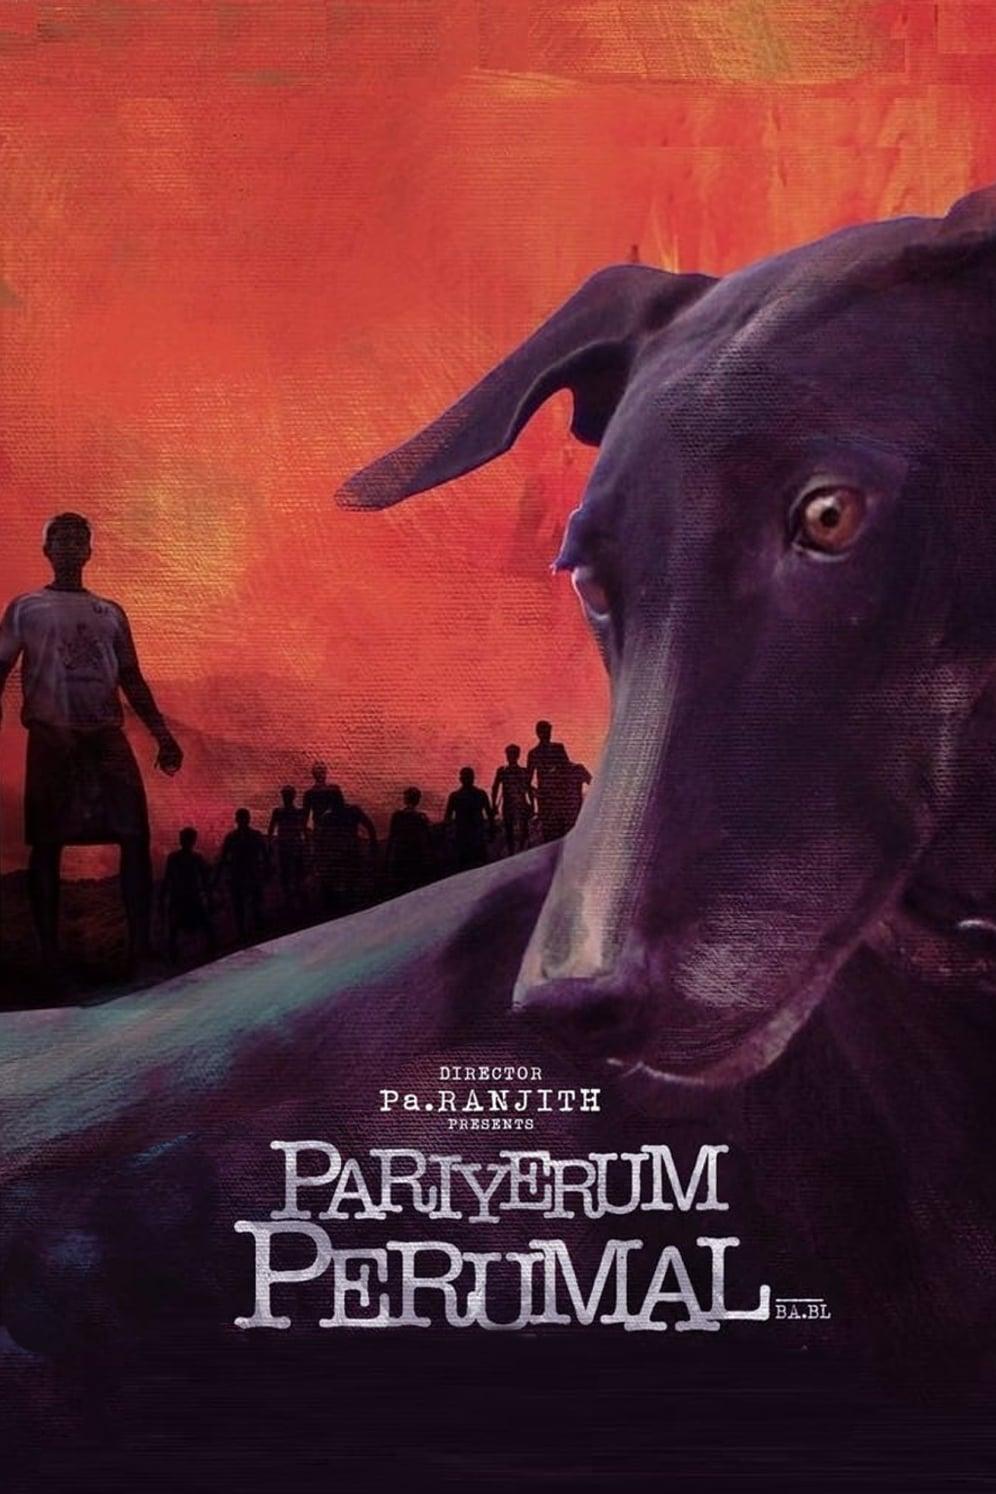 Pariyerum Perumal Movie Streaming Online Watch on Amazon